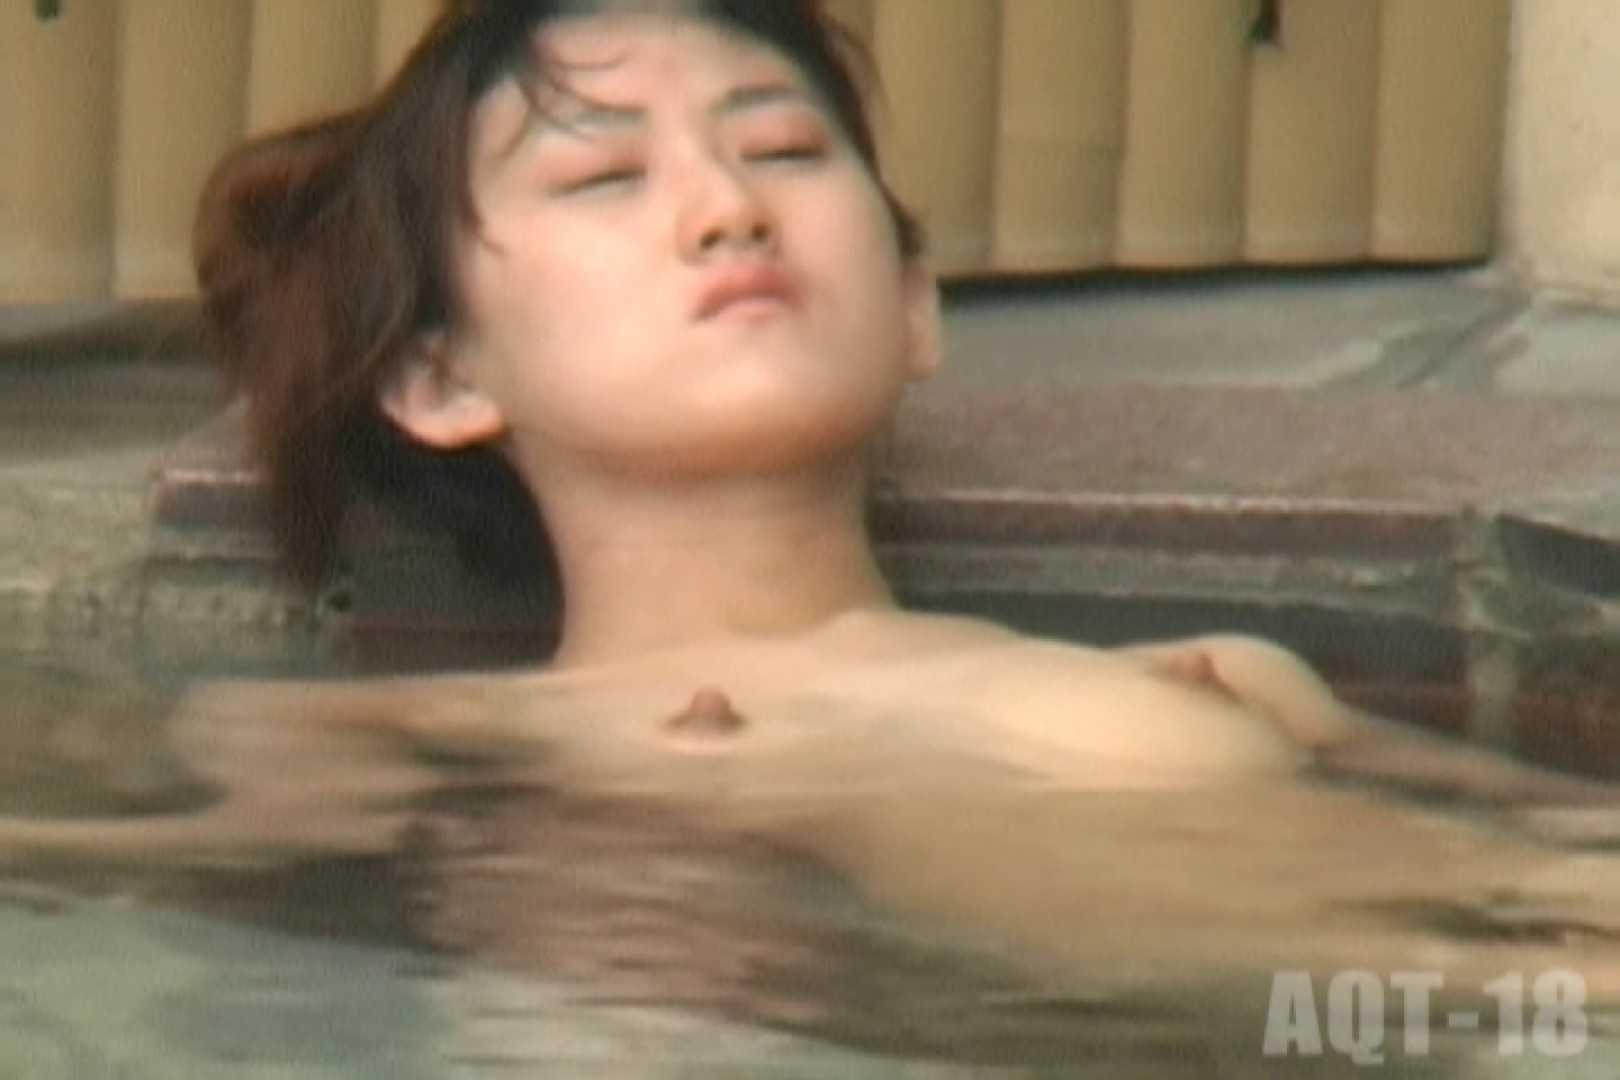 Aquaな露天風呂Vol.862 美しいOLの裸体 戯れ無修正画像 99pic 53